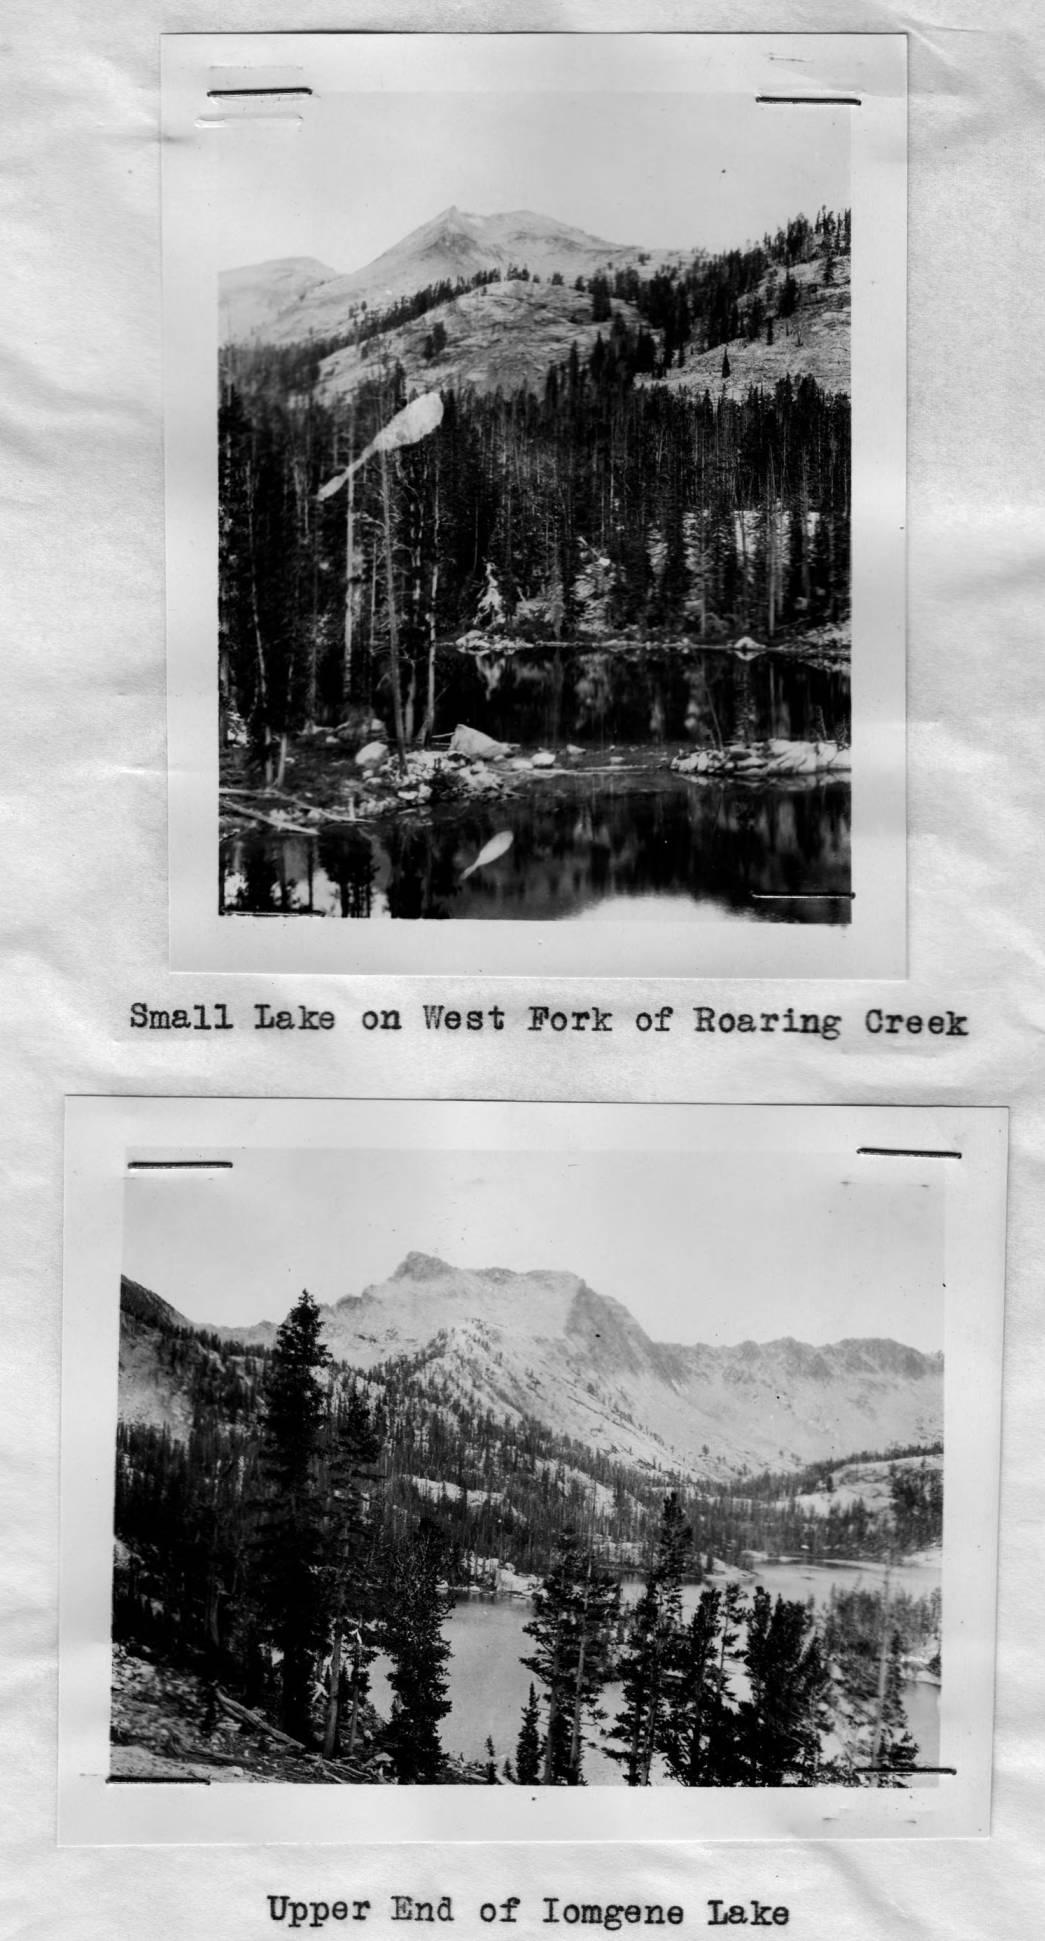 item thumbnail for Imogene Lake and small lake near West Fork of Roaring Creek